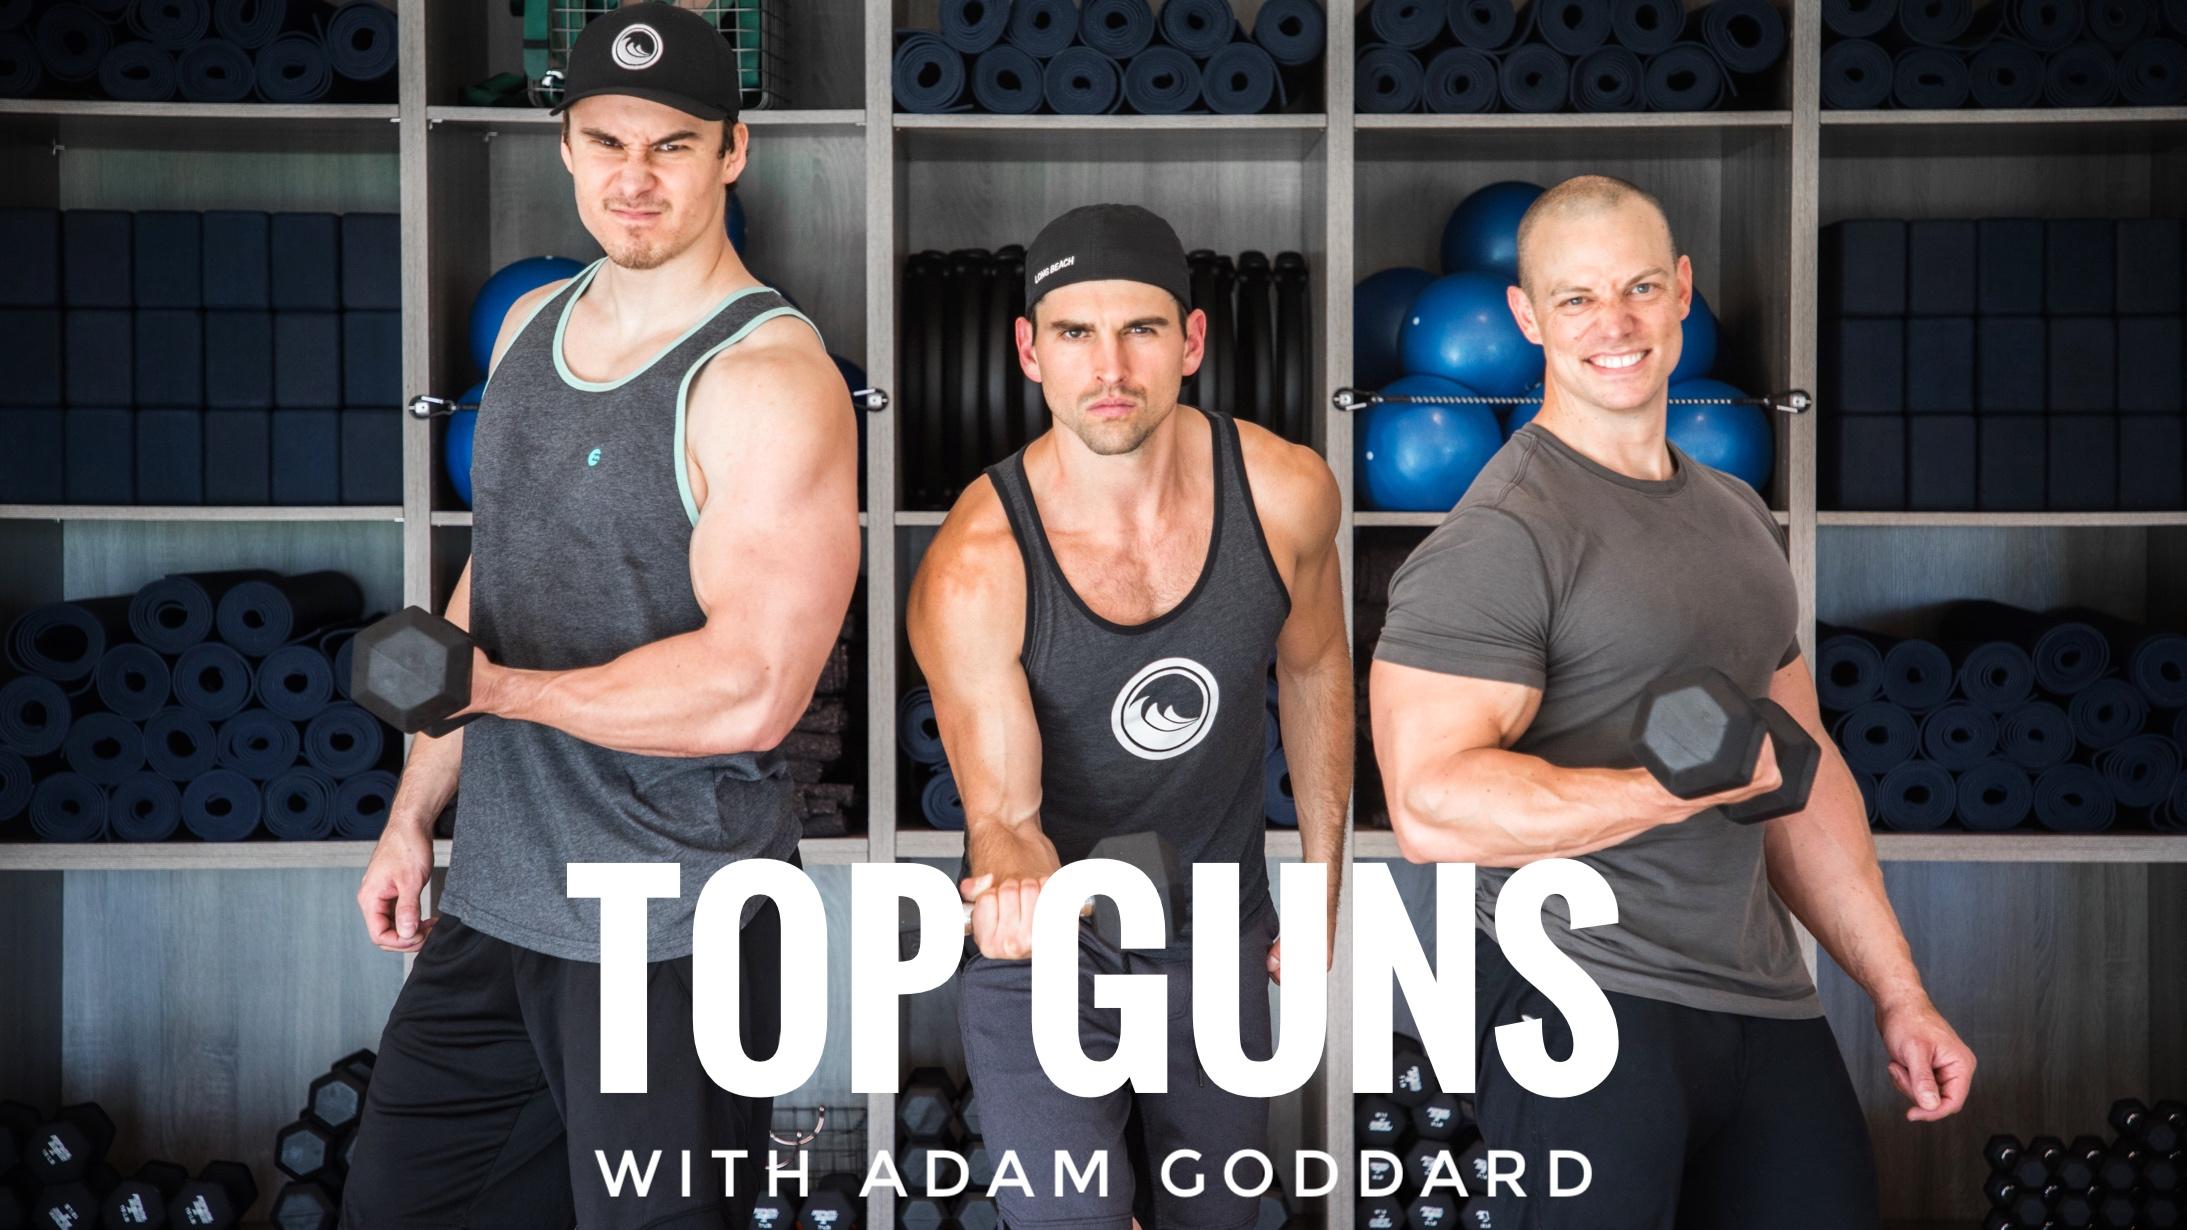 Top Guns with Adam Goddard